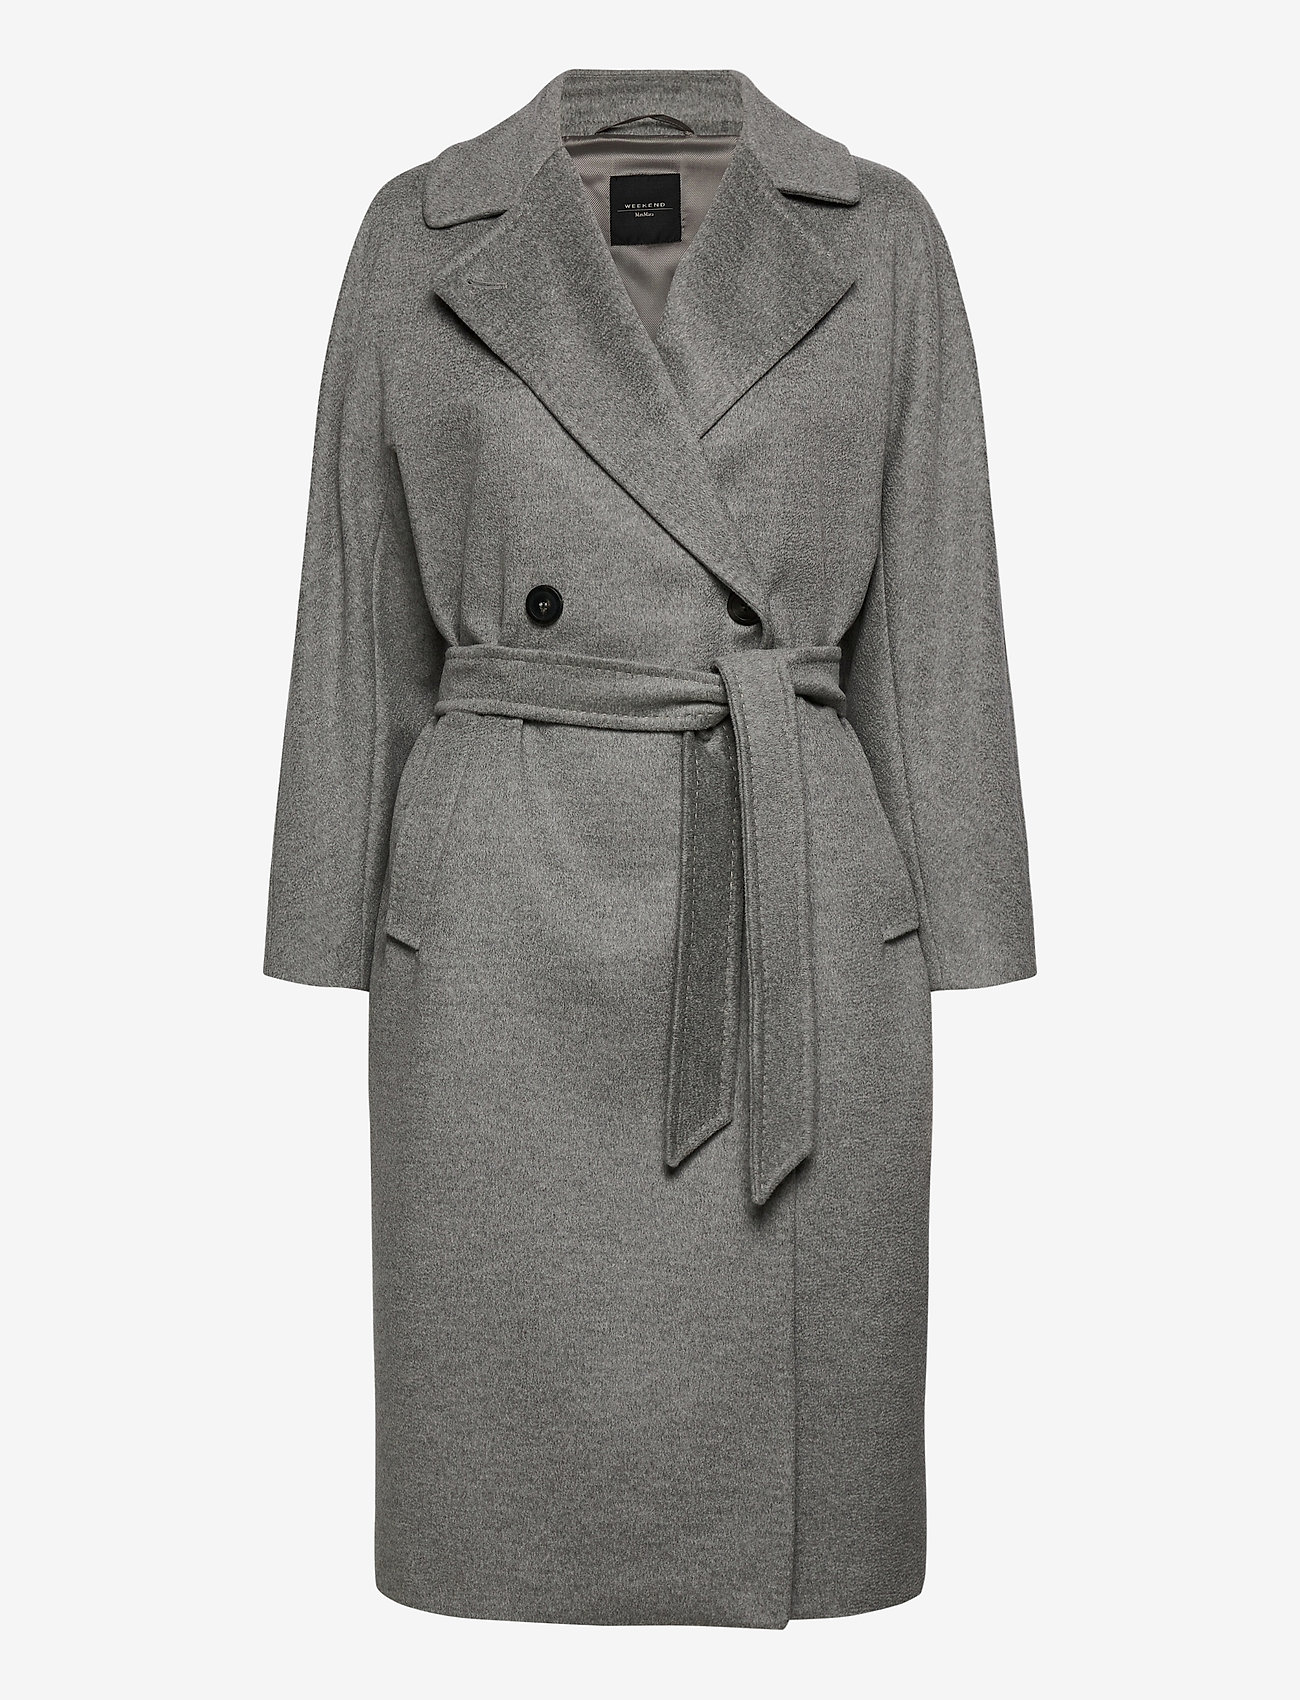 Weekend Max Mara - RESINA - trenchcoats - light grey - 0